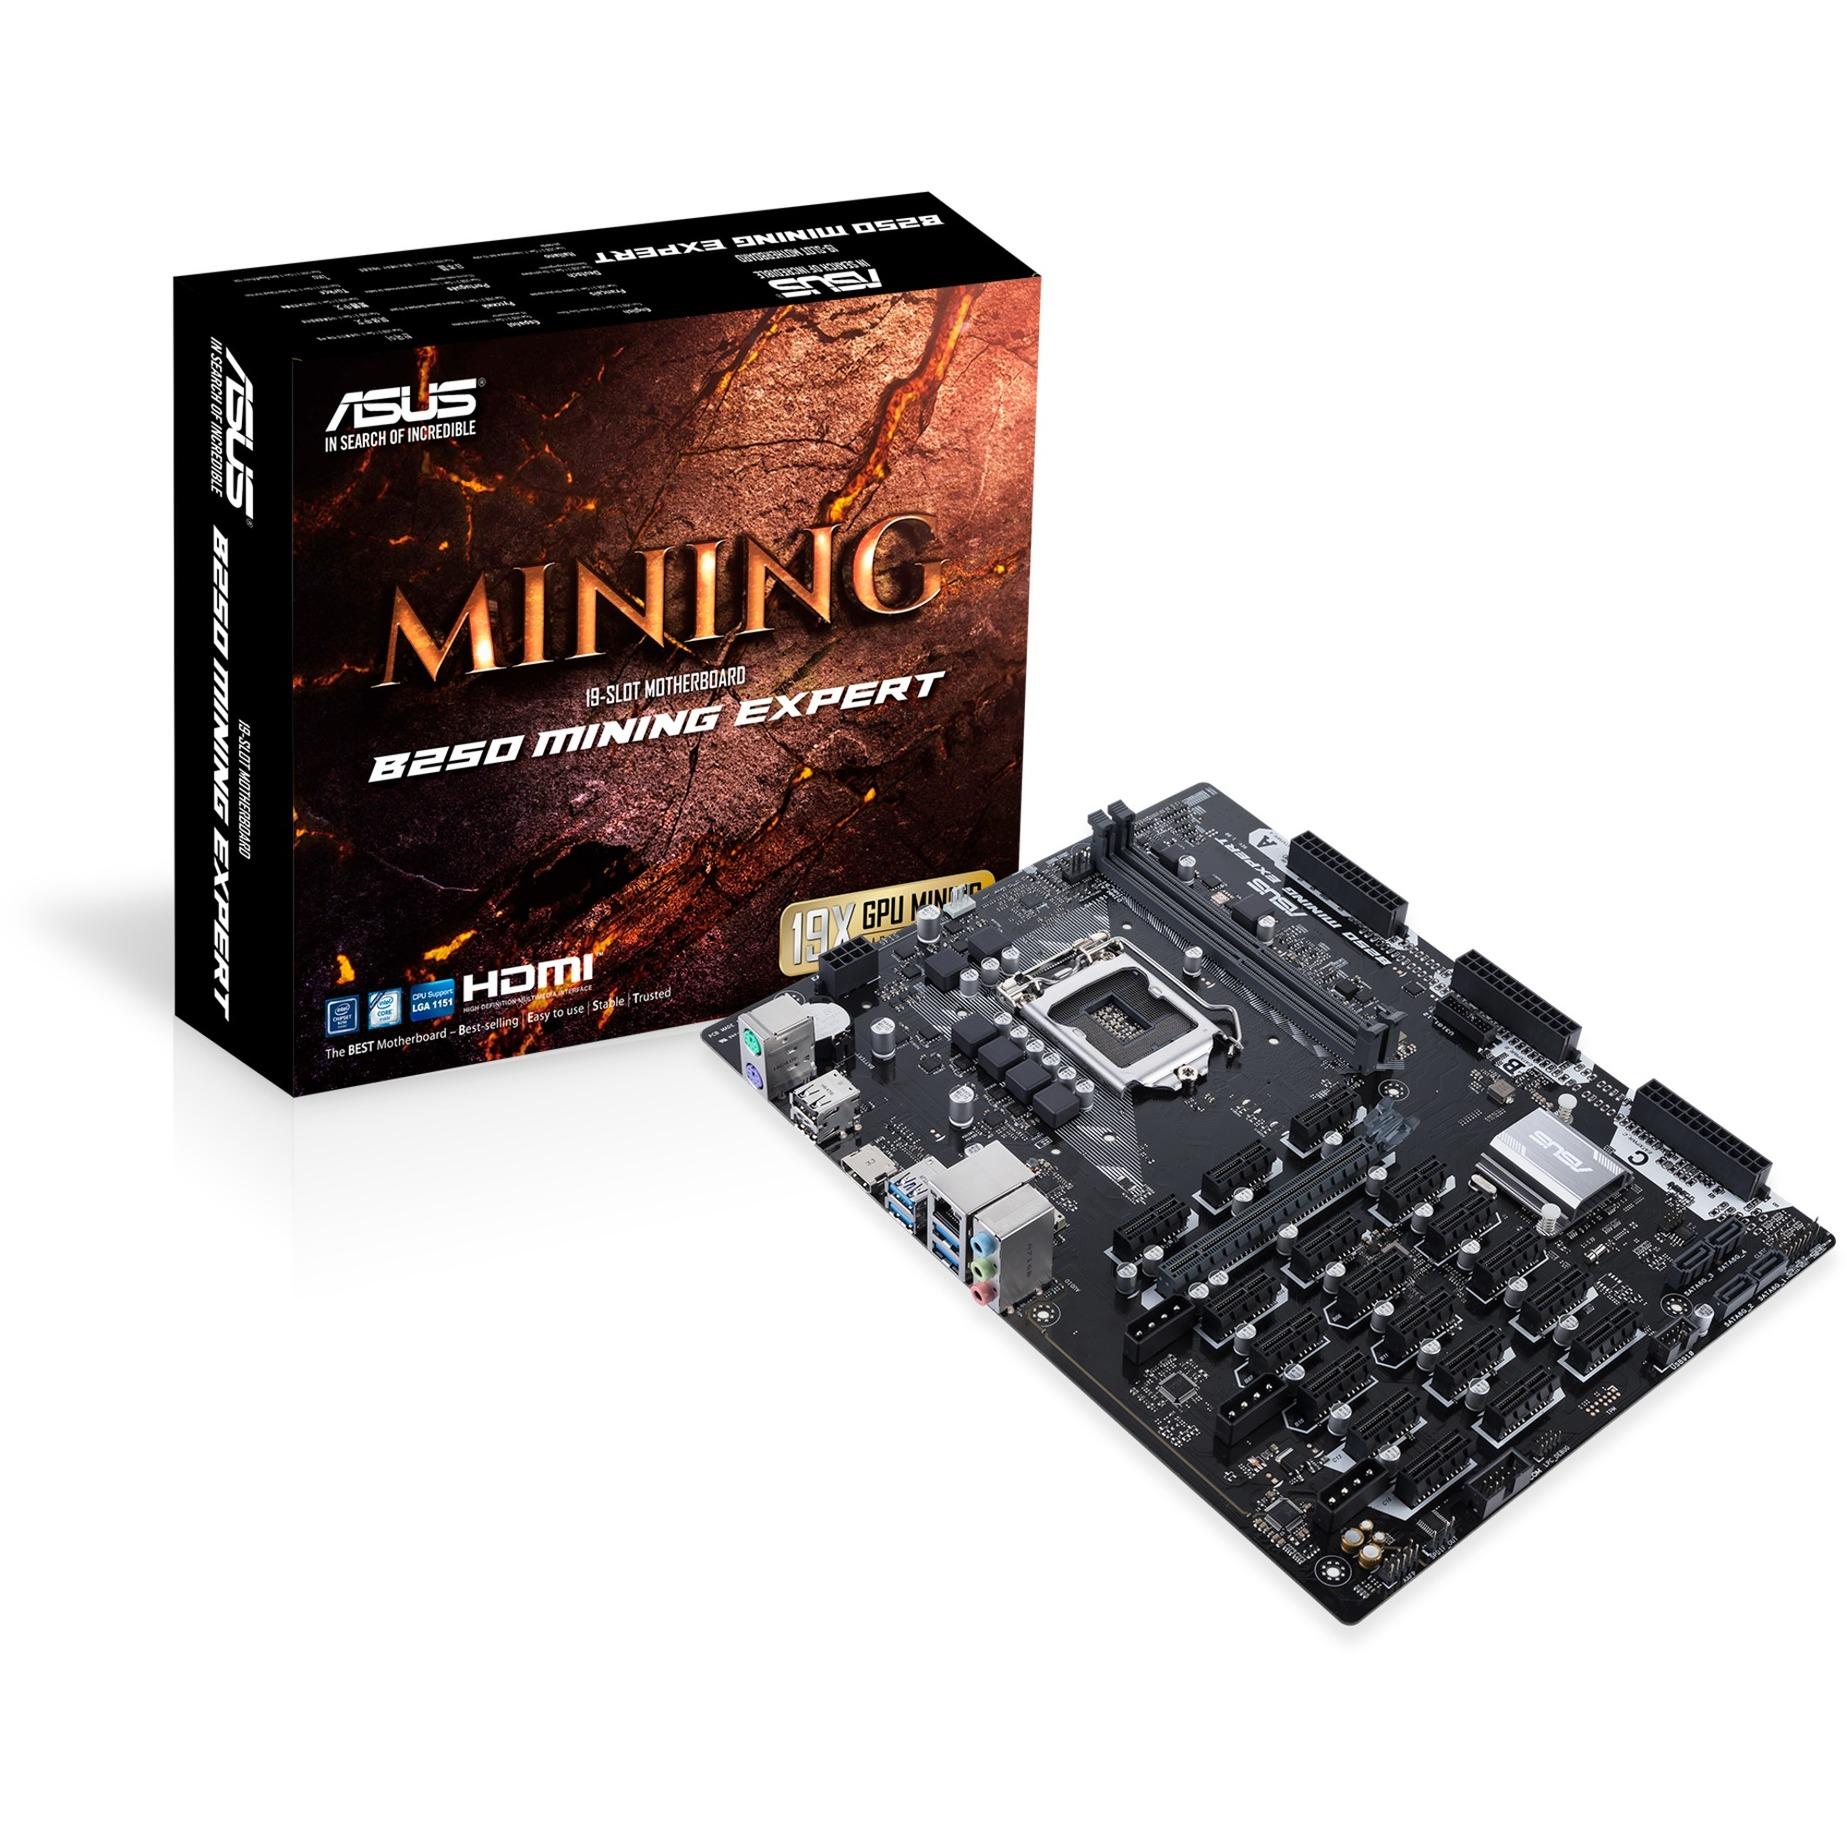 B250 MINING EXPERT Intel B250 LGA 1151 (Zócalo H4) ATX, Placa base